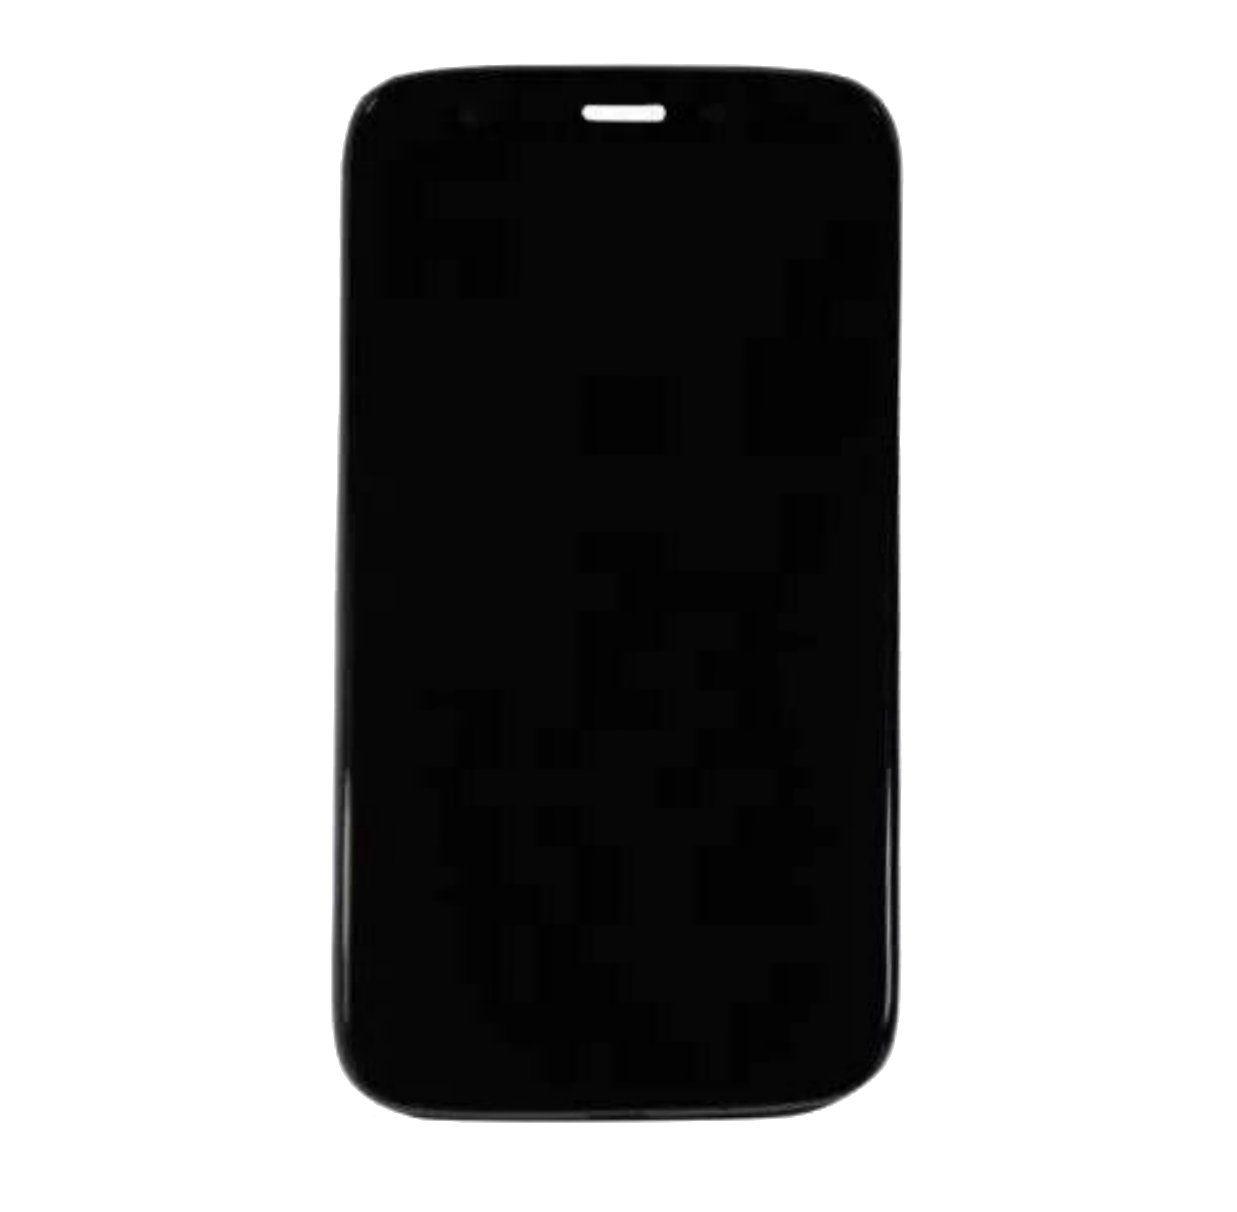 Display Frontal Moto G Xt1032 Xt1033 Aro 1 Linha